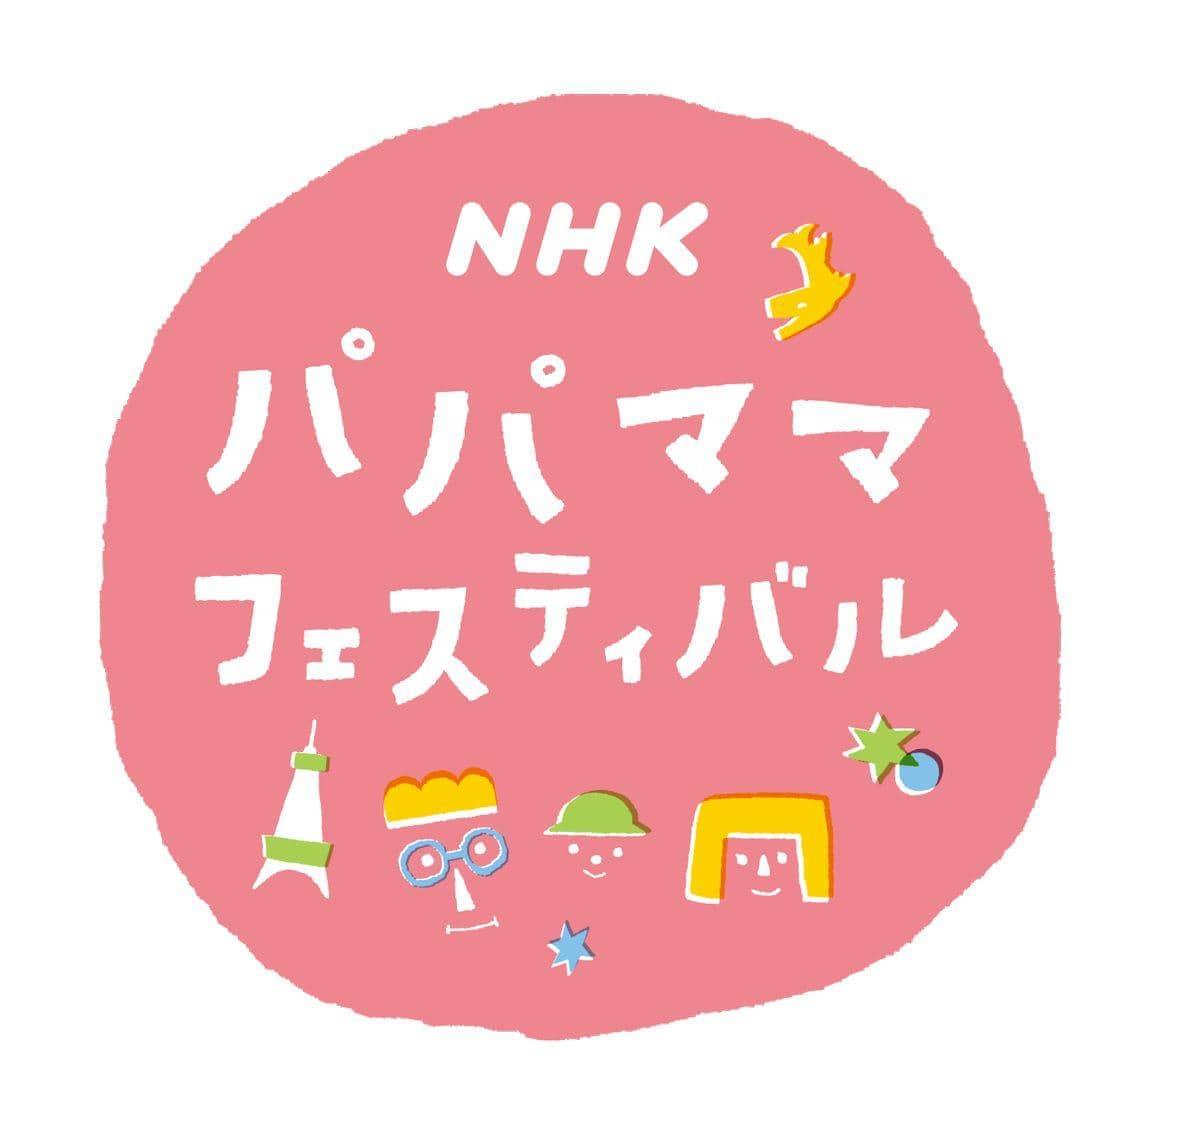 NHK名古屋放送センタービルで開催される「NHKパパママフェスティバル」 (C)NHK